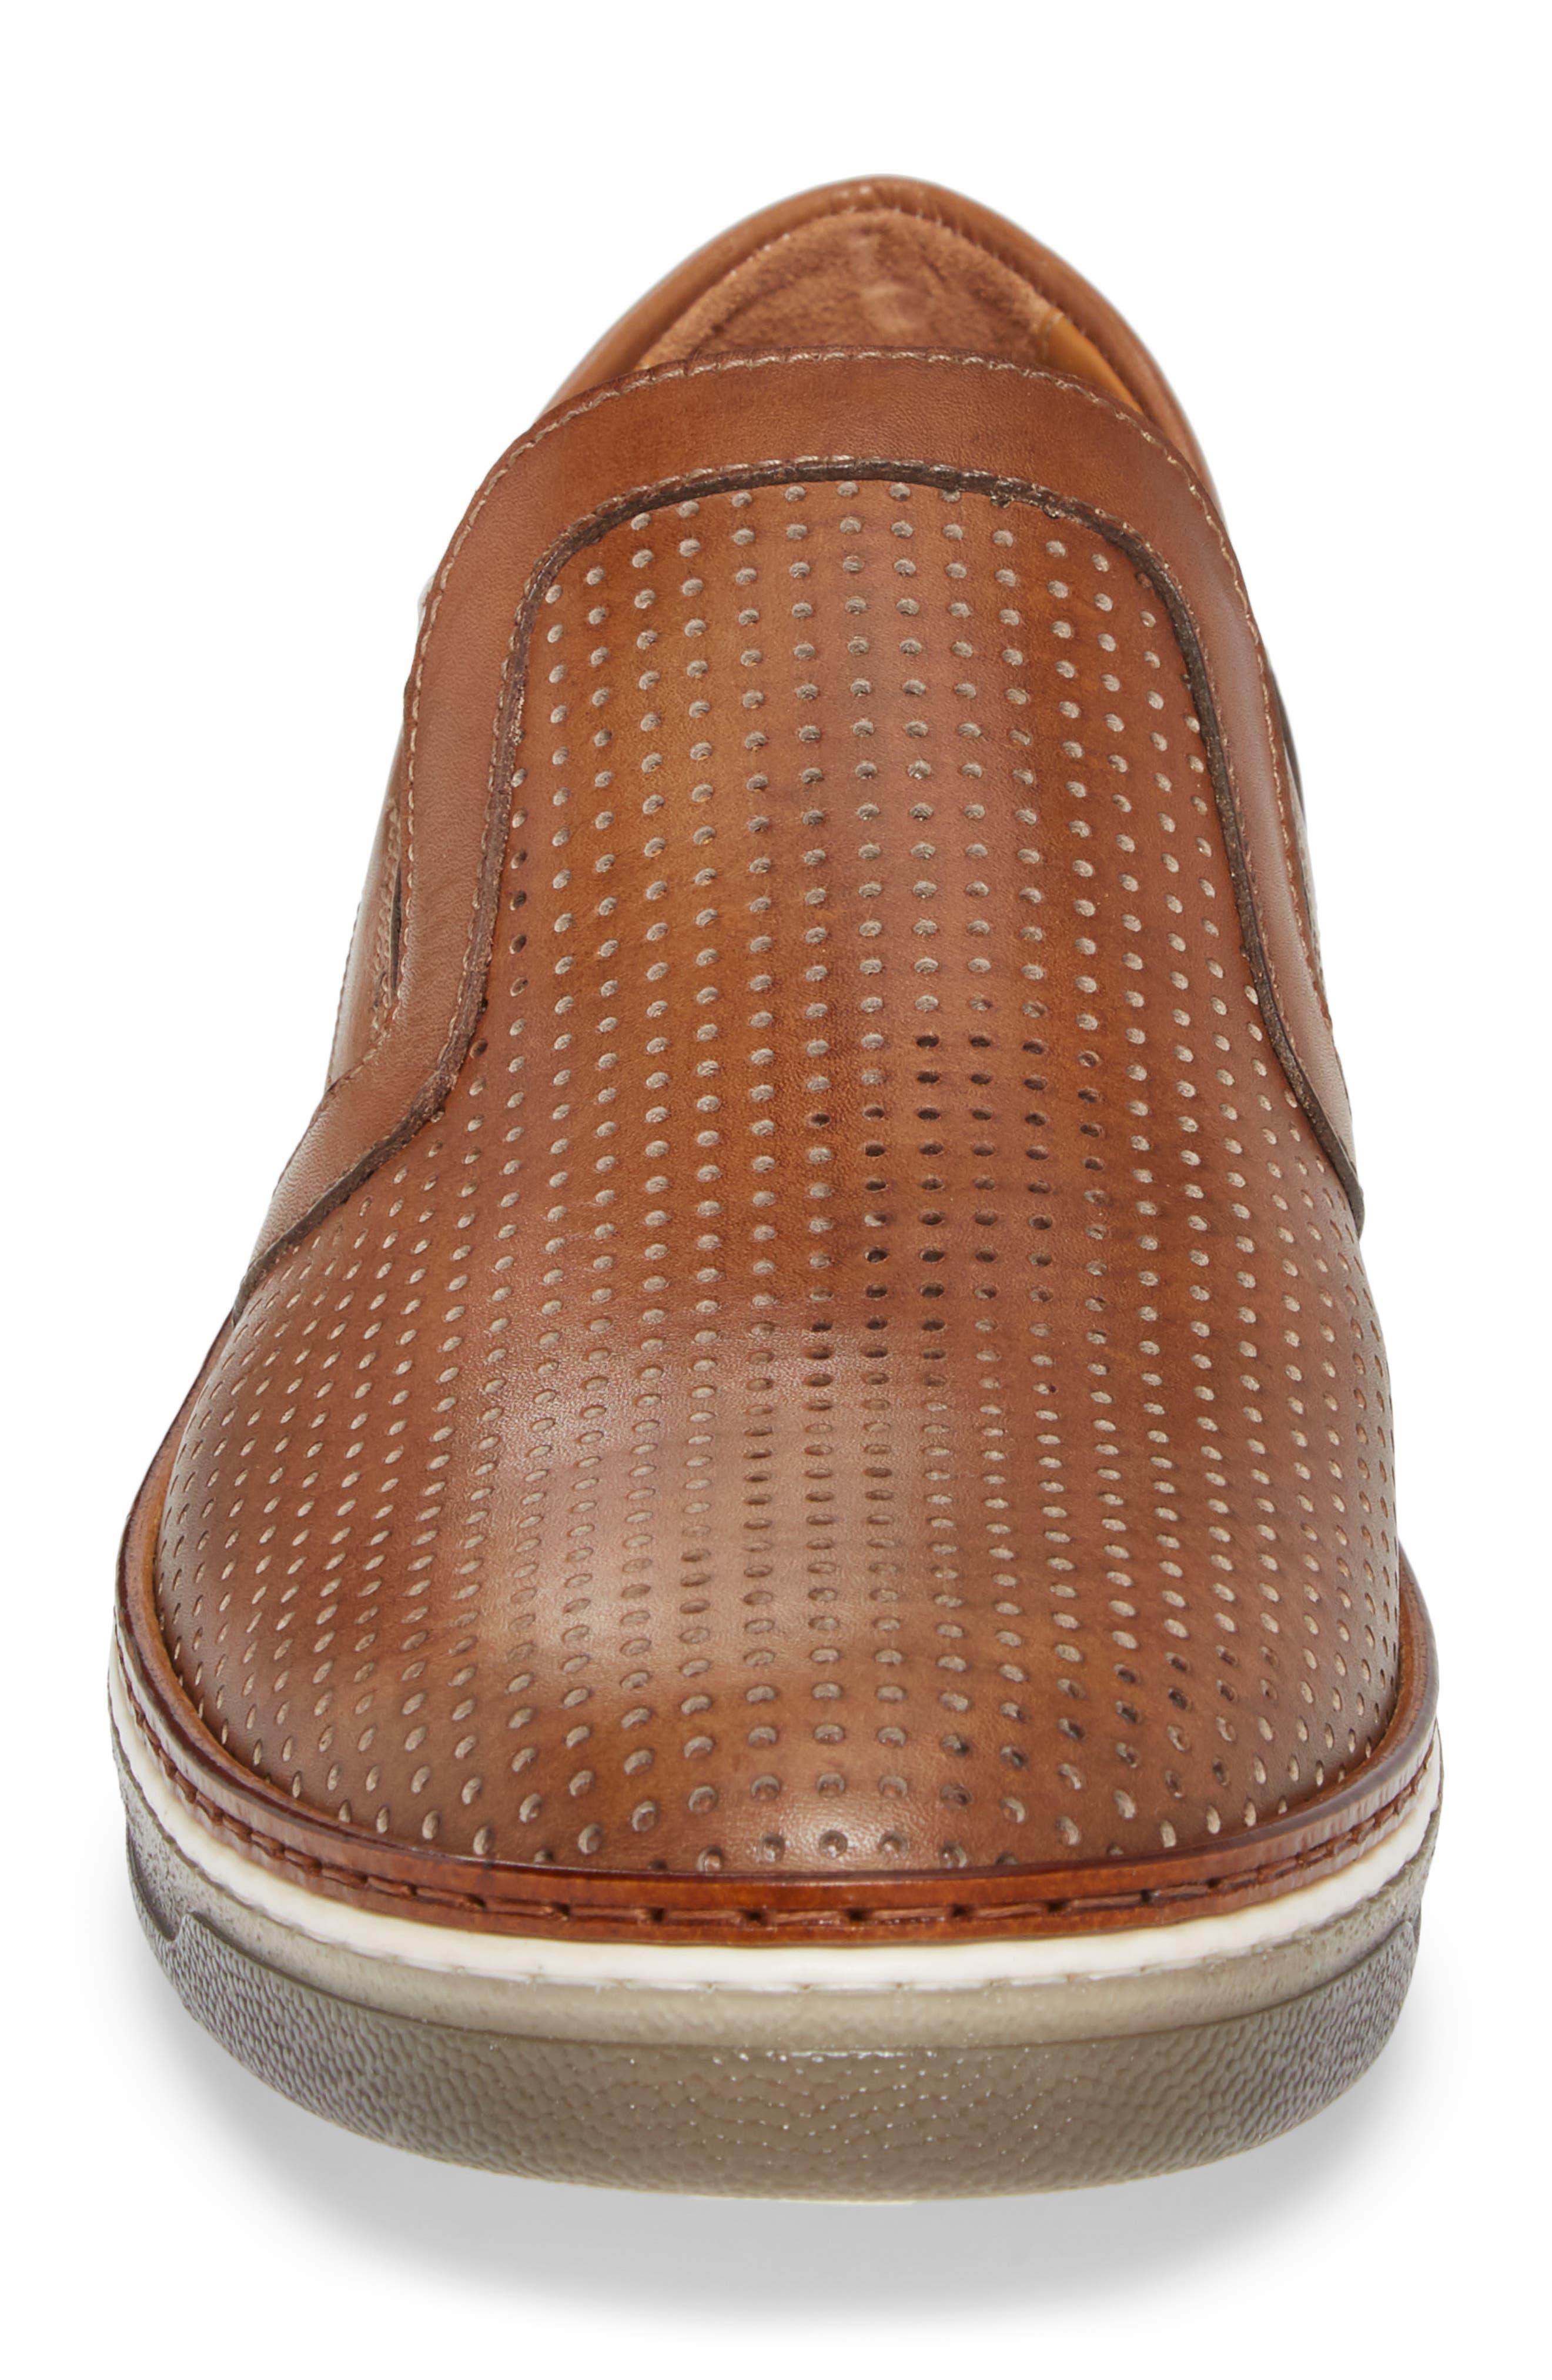 Josh Weatherproof Slip-On Sneaker,                             Alternate thumbnail 4, color,                             COGNAC